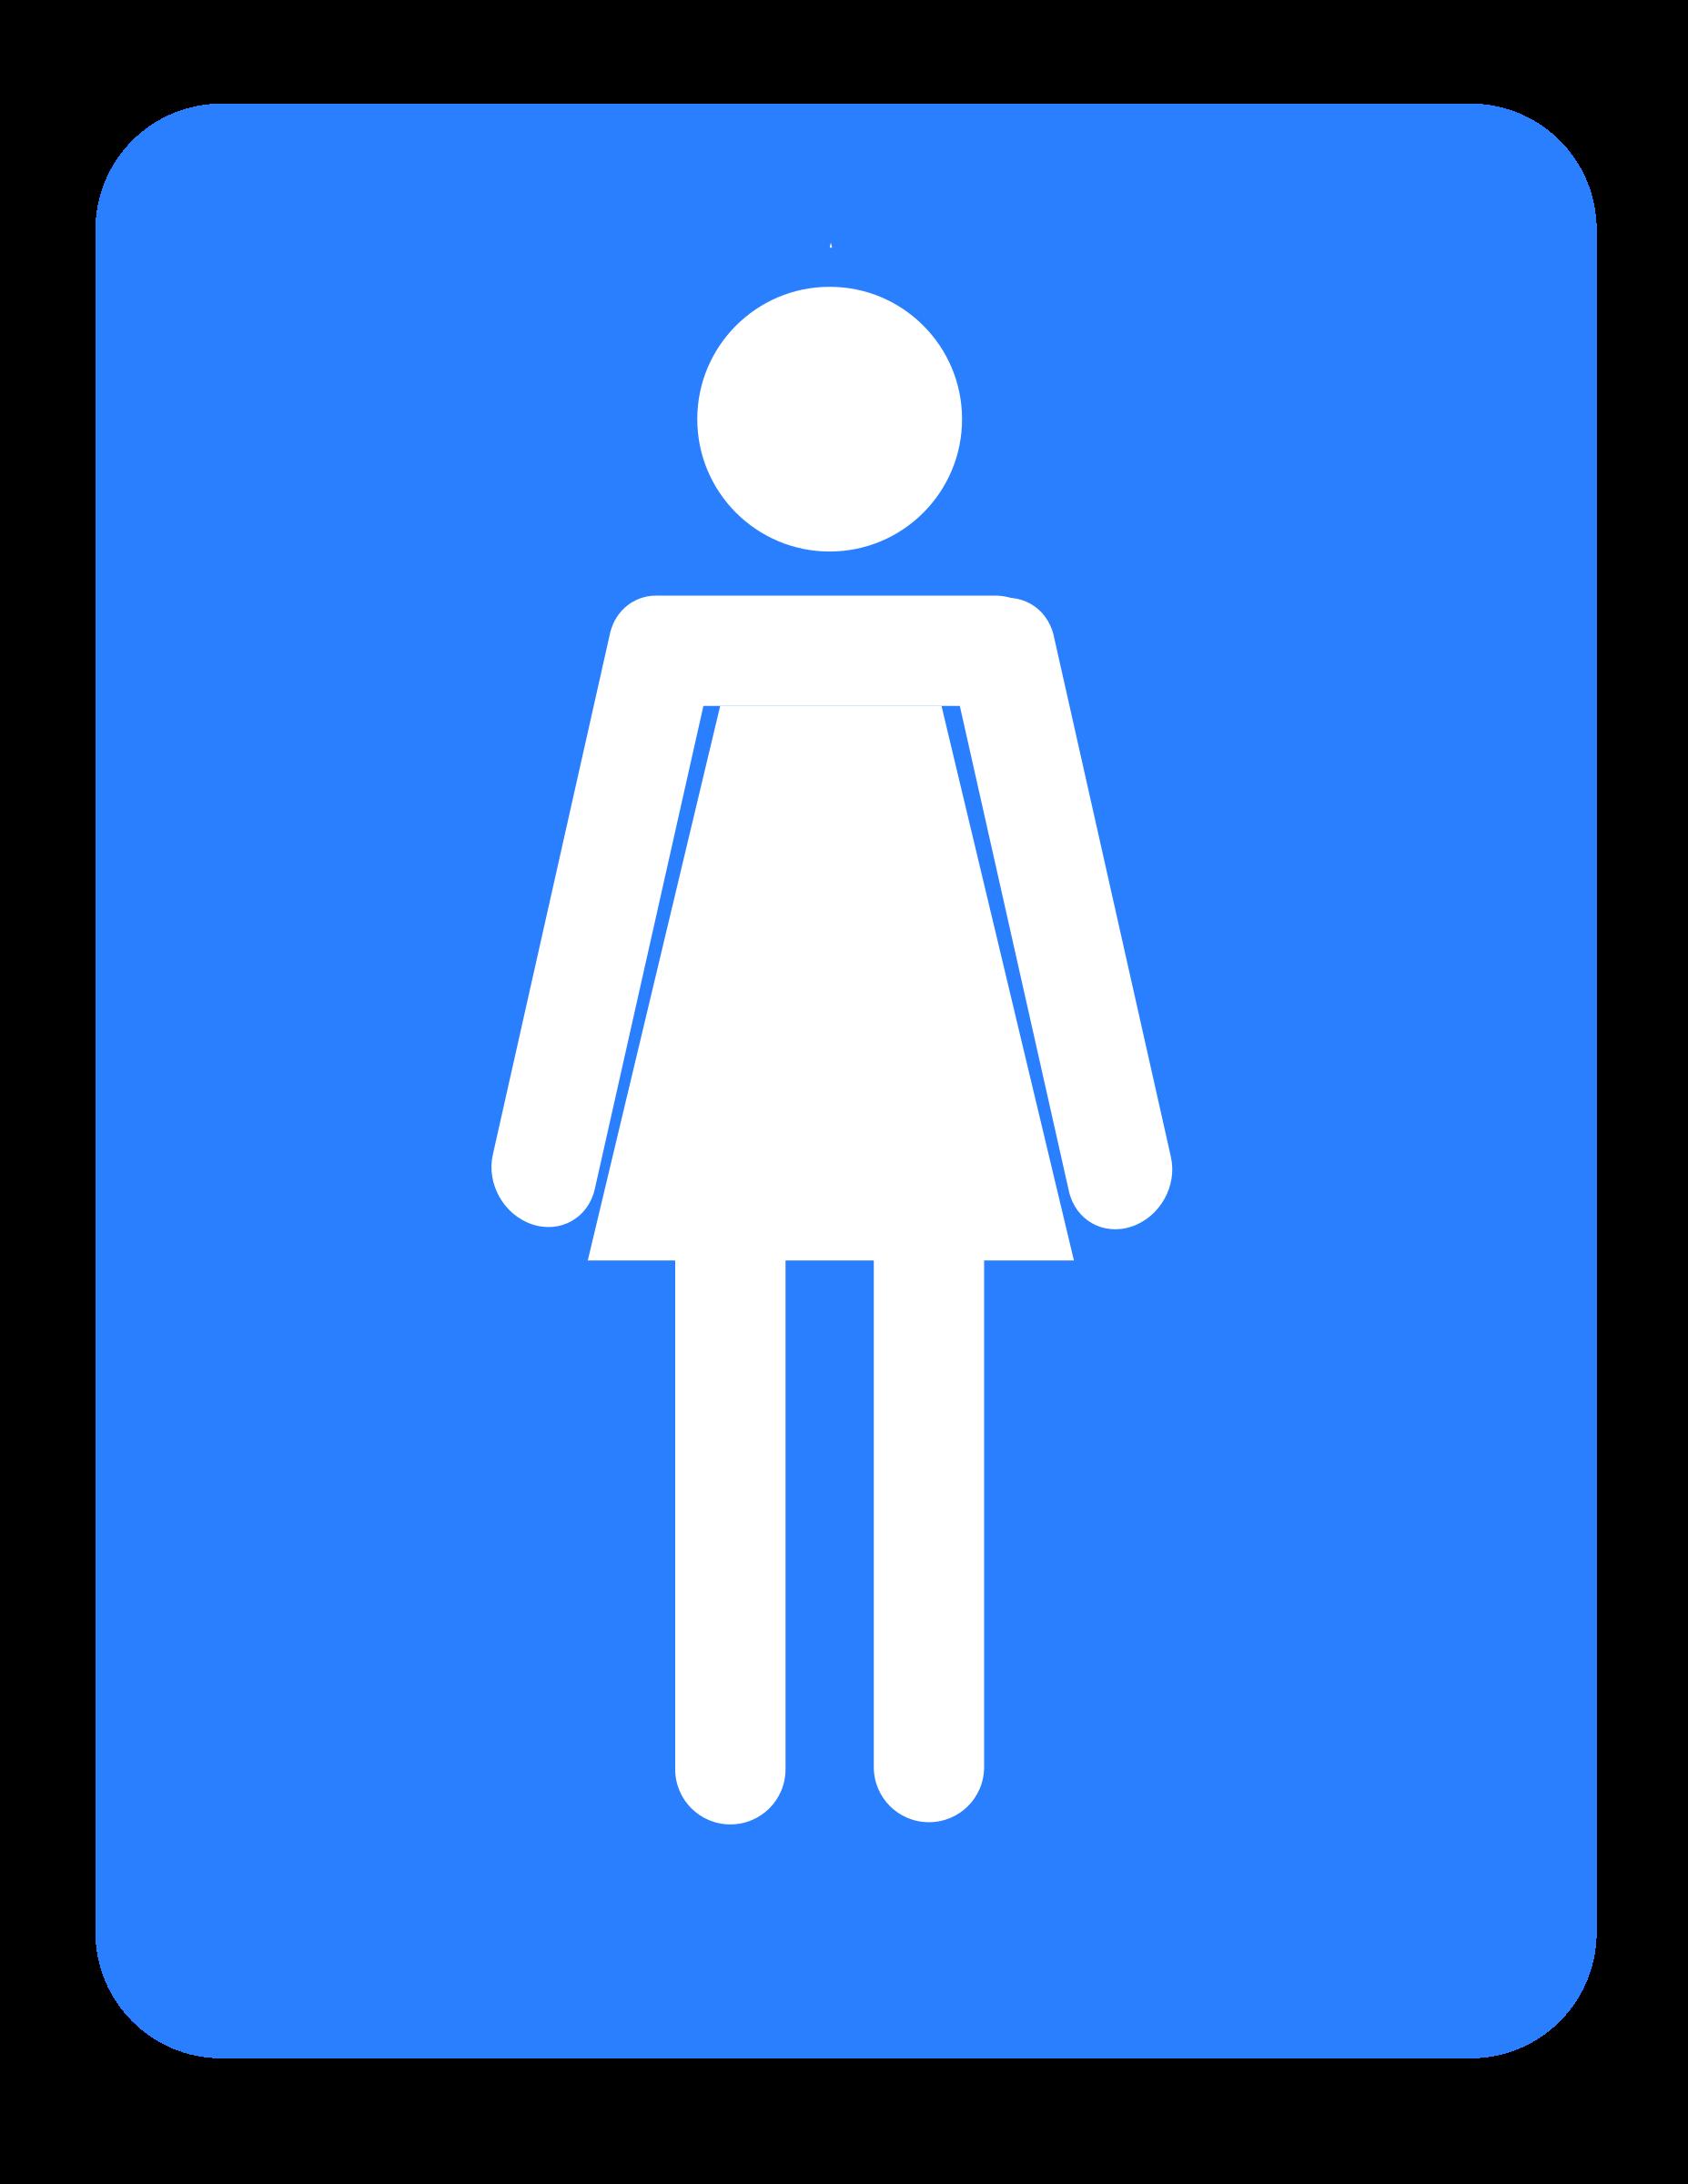 Women big image png. Clipart woman bathroom